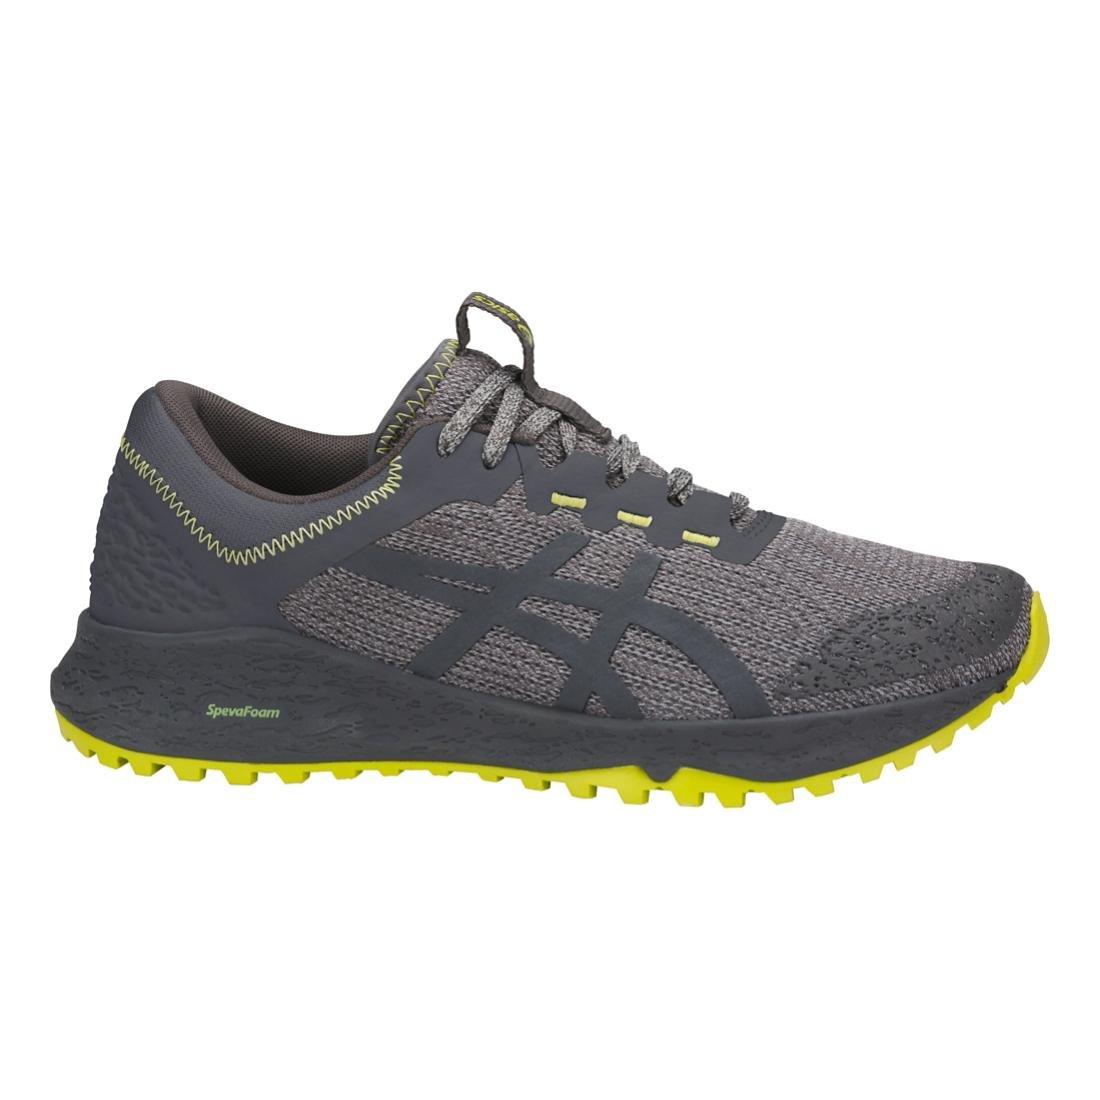 ASICS Women's Alpine XT Running Shoe B074CKJK7T 7 B(M) US|Mid Grey/Carbon/Sulphur Spring